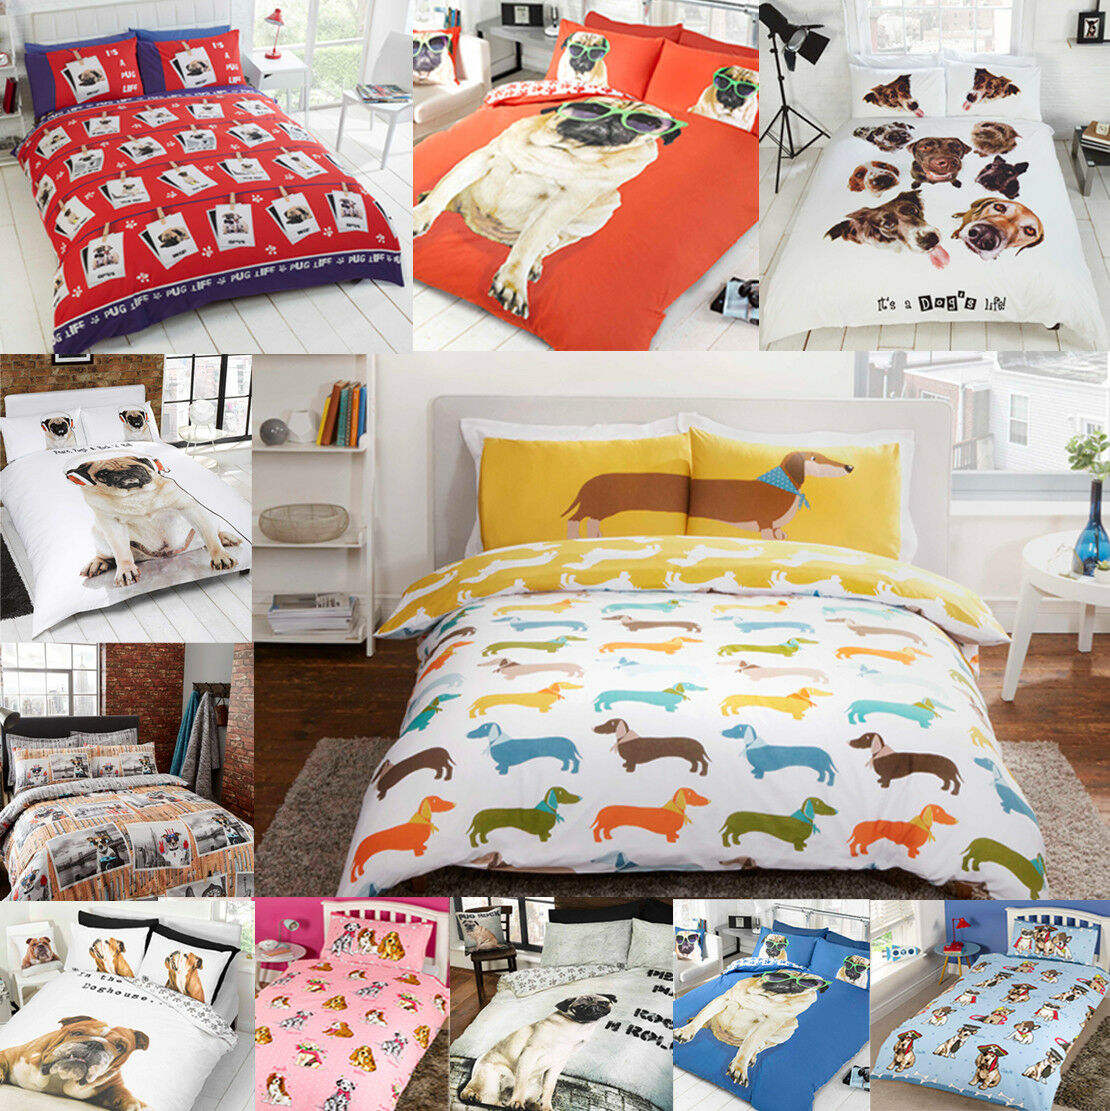 Mops Hündchen   Süß Hündchen   Bulldogge Bettwäscheset & Kissenbezug  | Beliebte Empfehlung